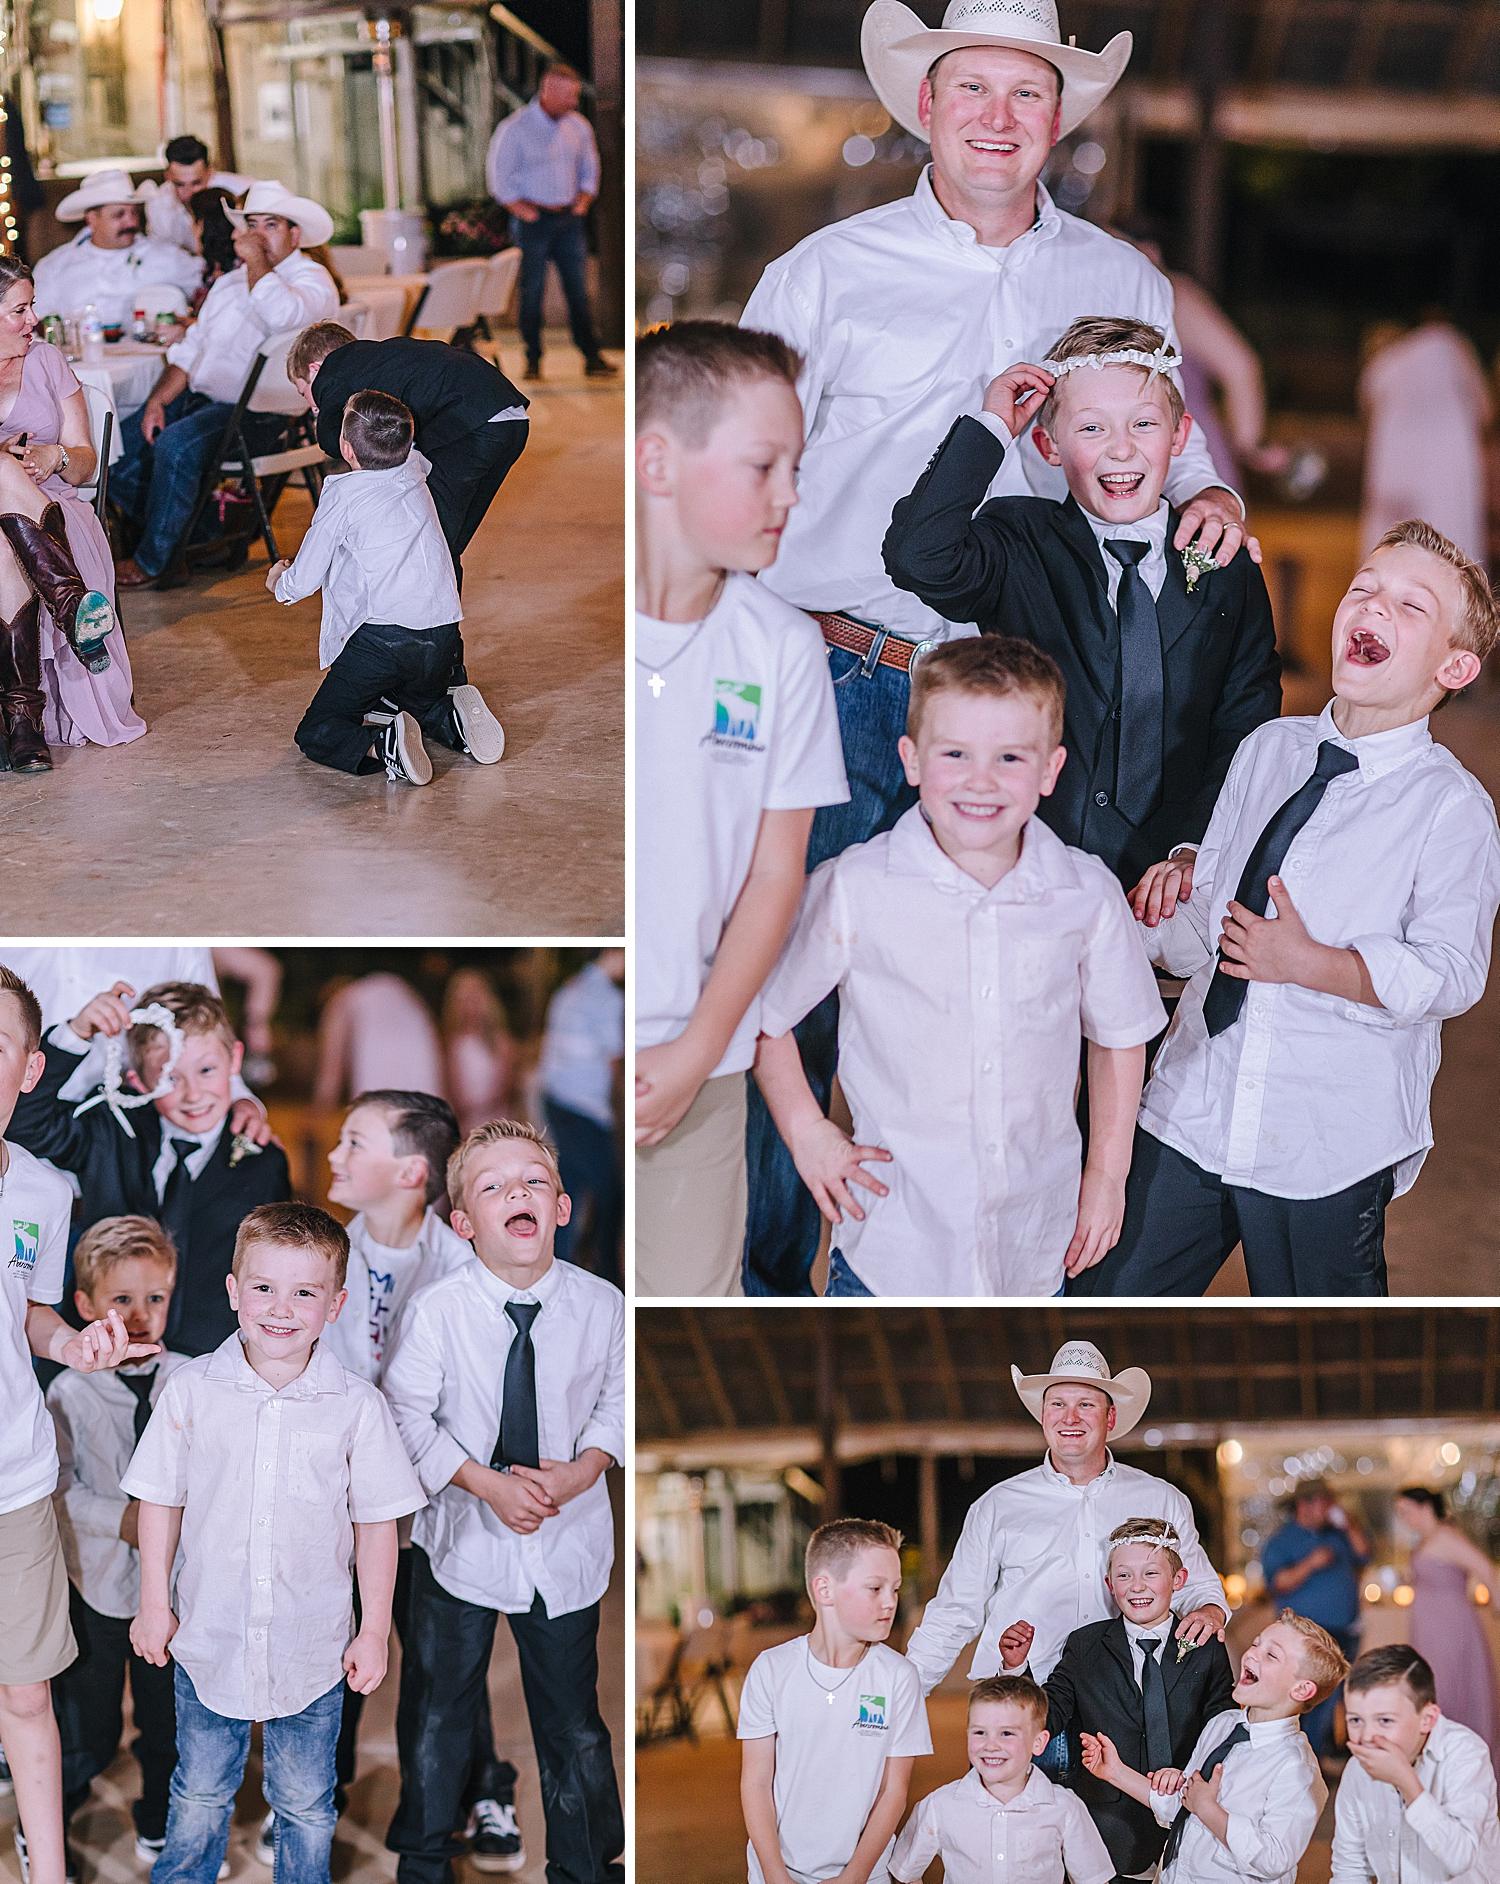 Rio-Cibilo-Ranch-Marion-Texas-Wedding-Rustic-Blush-Rose-Quartz-Details-Carly-Barton-Photography_0092.jpg